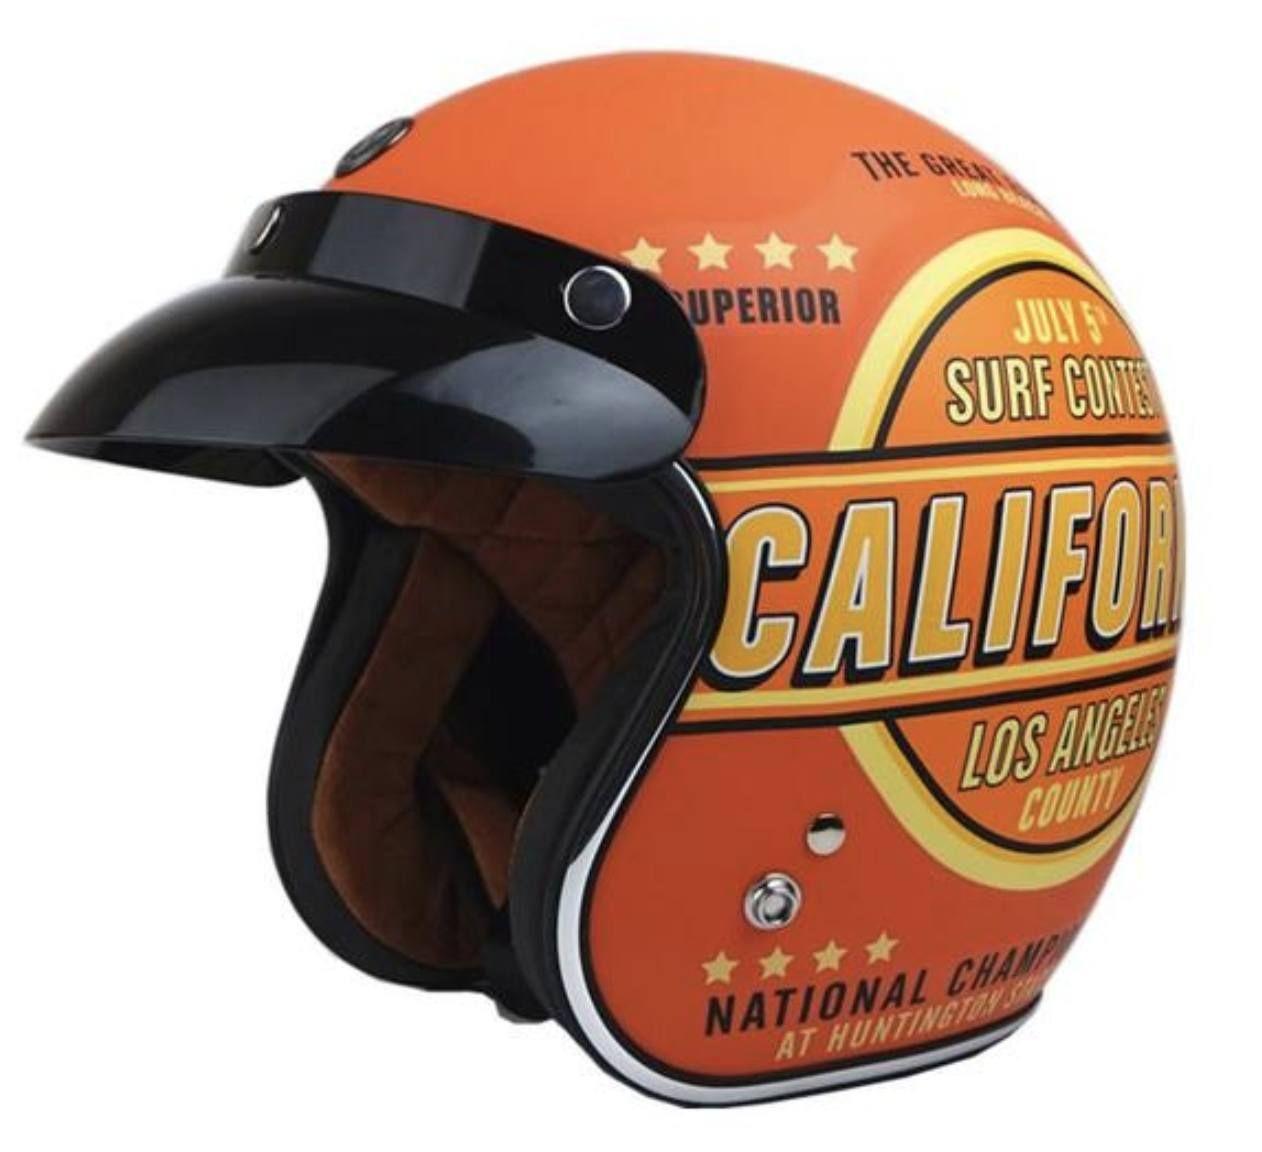 Dot Certified Retro Motorcycle Helmets Retro Motorcycle Helmets Open Face Motorcycle Helmets Motorcycle Helmets